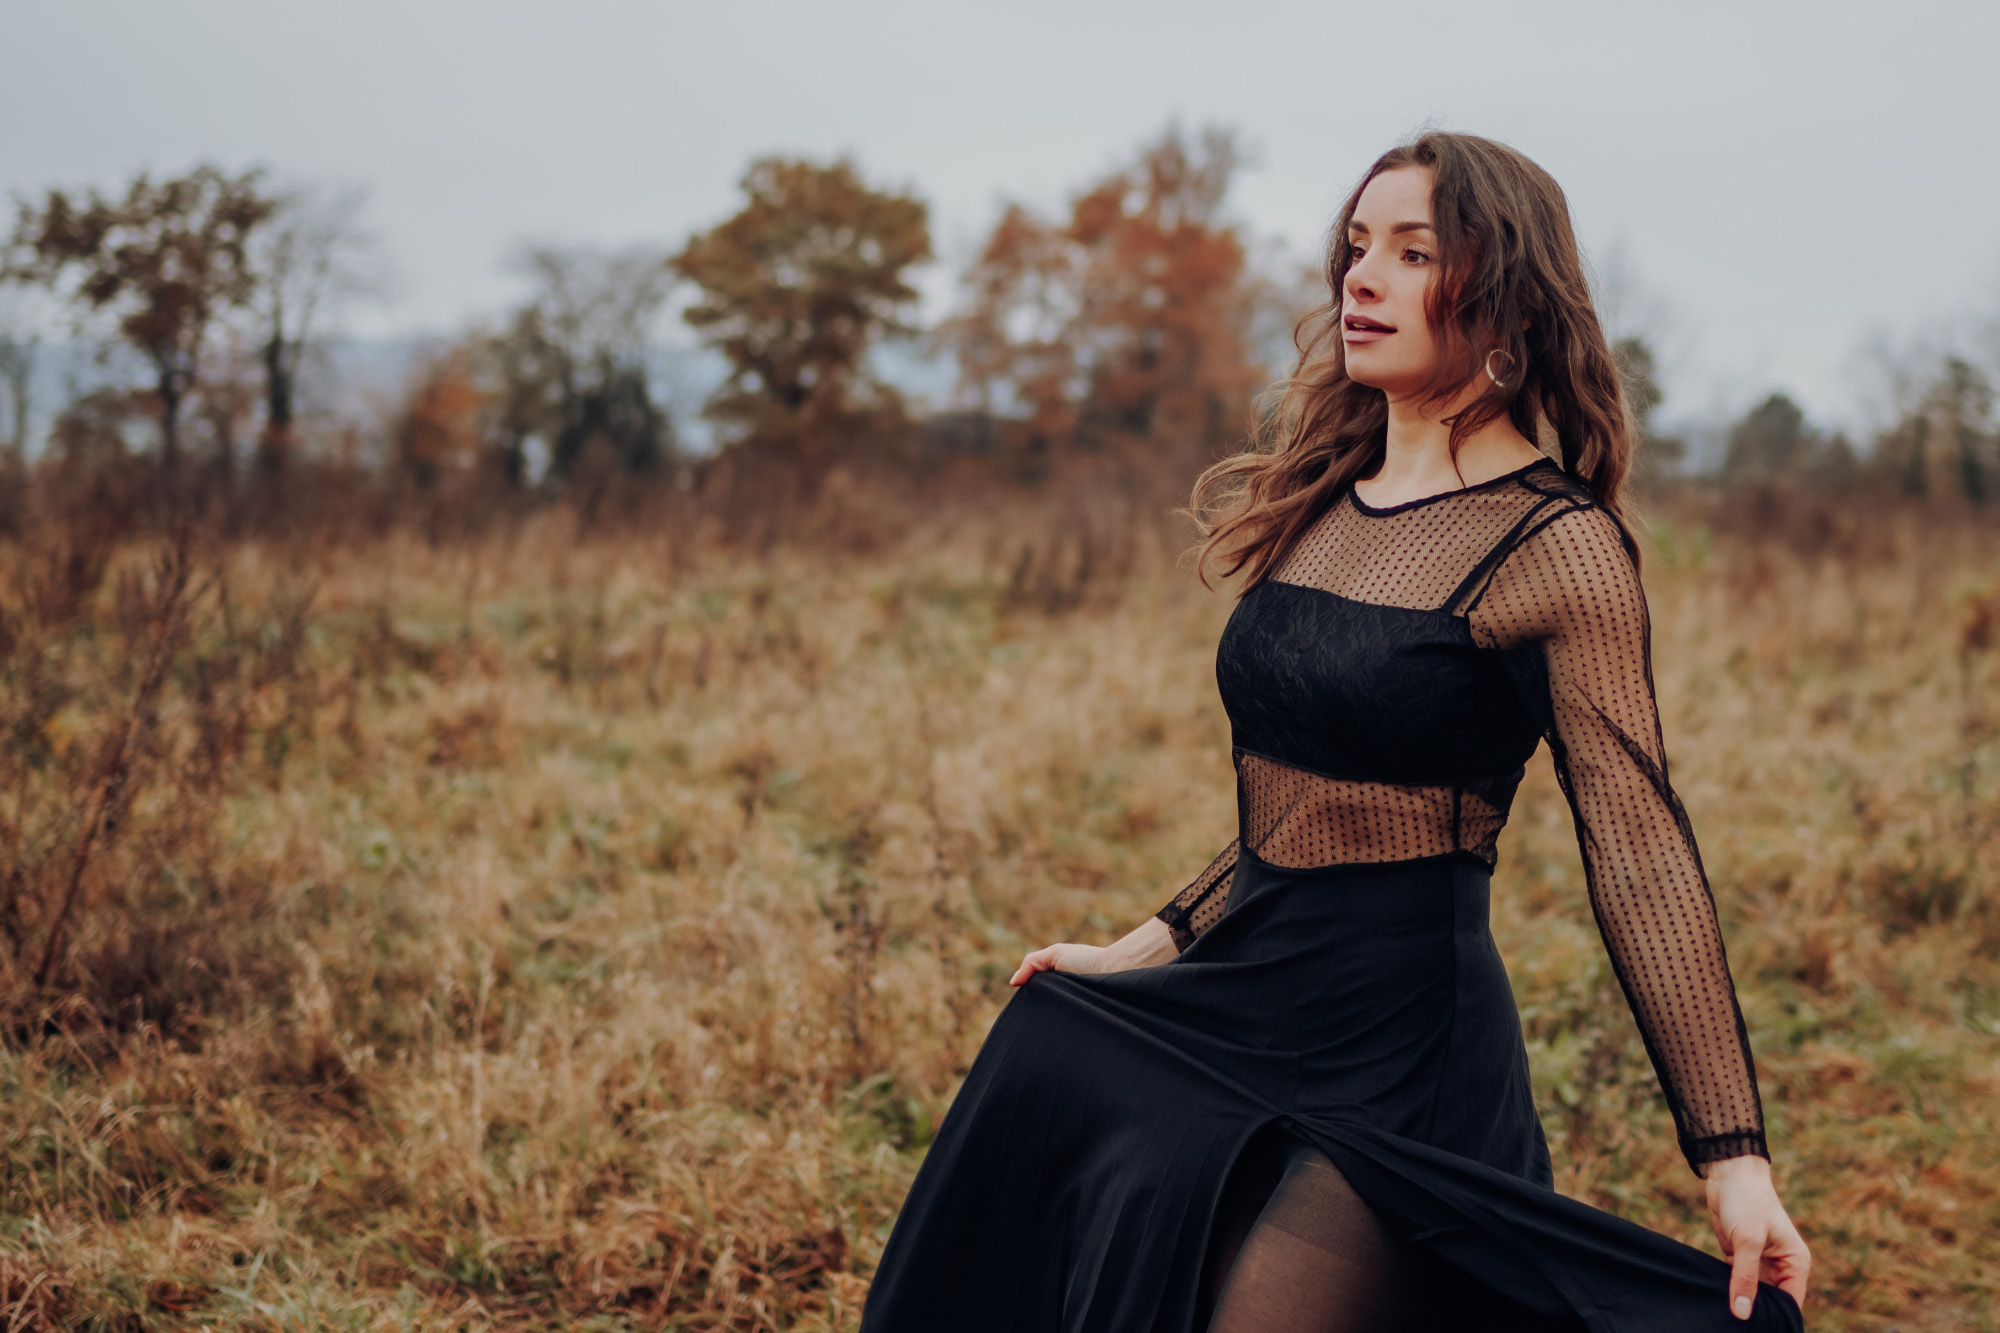 Sängerin Christina Woods